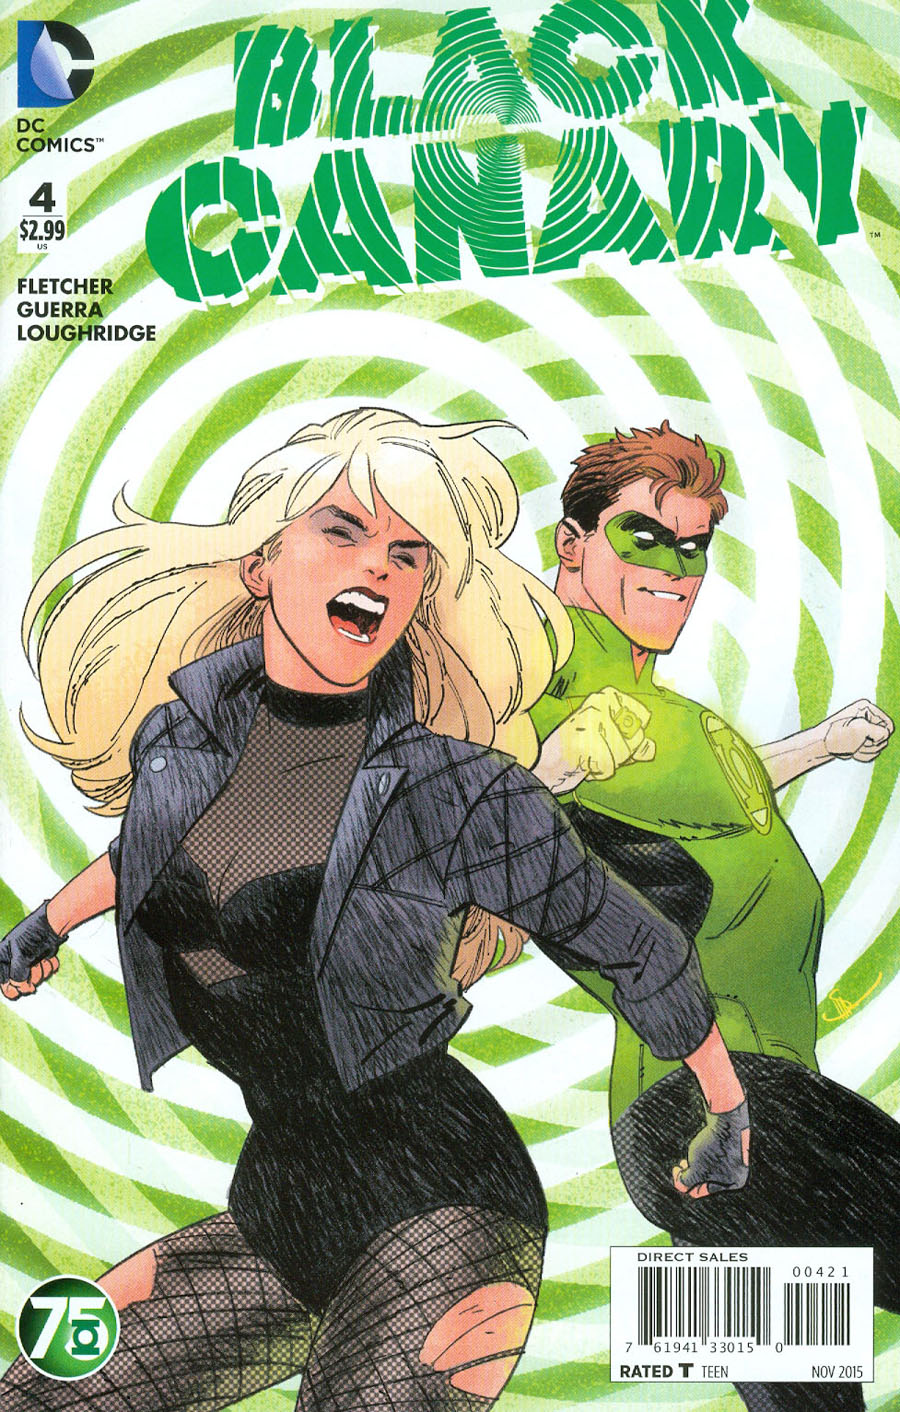 Black Canary Vol 4 #4 Cover B Variant Evan Doc Shaner Green Lantern 75th Anniversary Cover